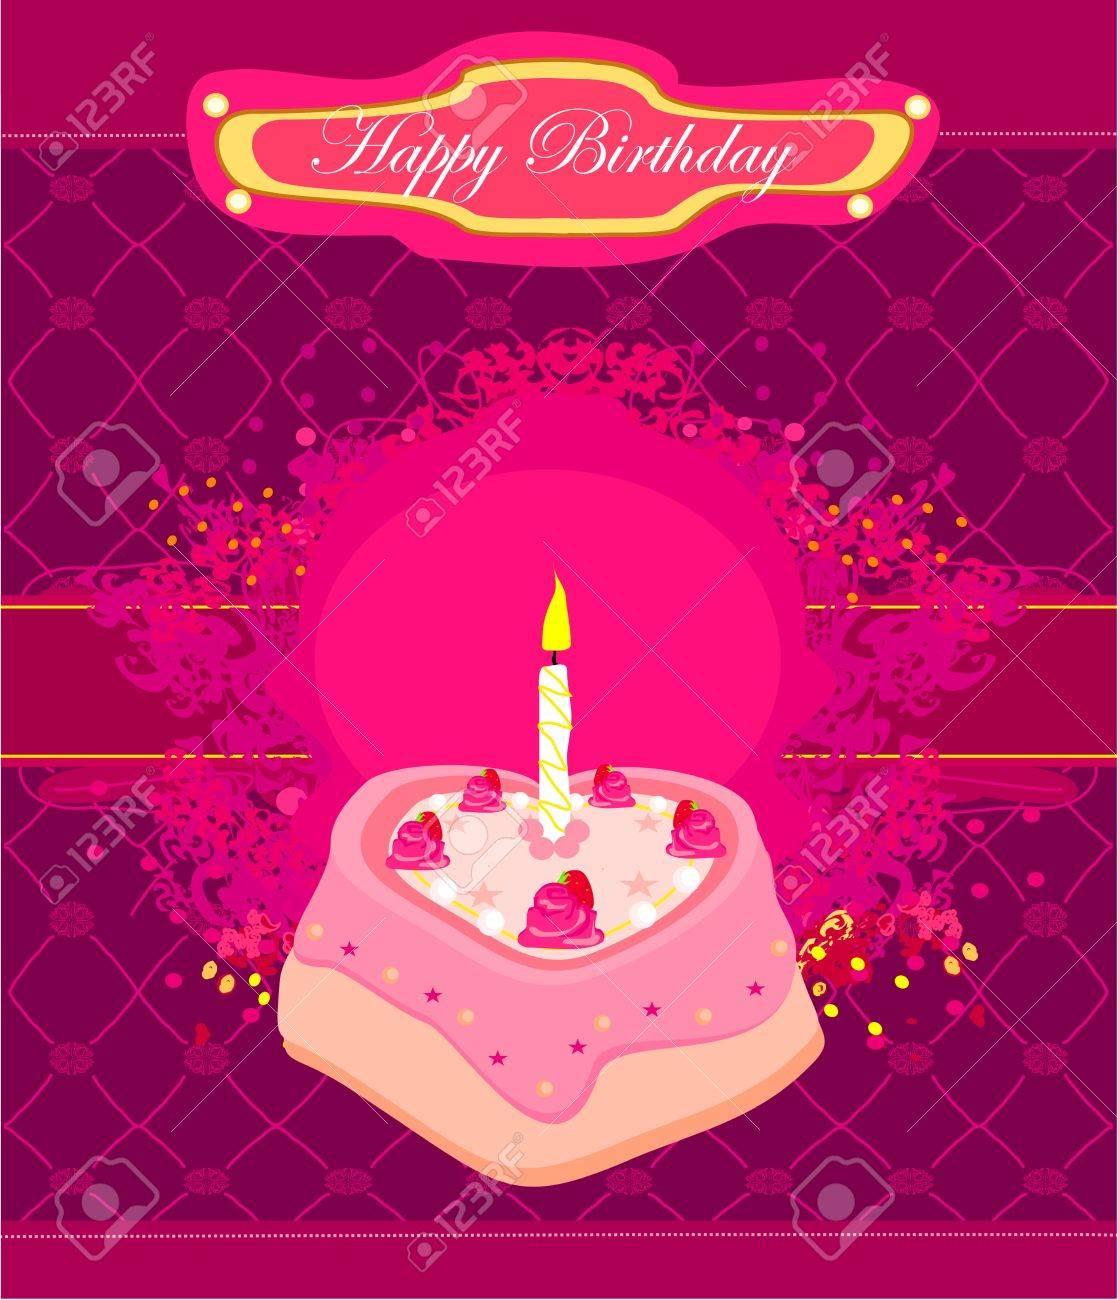 Happy Birthday Card Stock Vector - 13909917